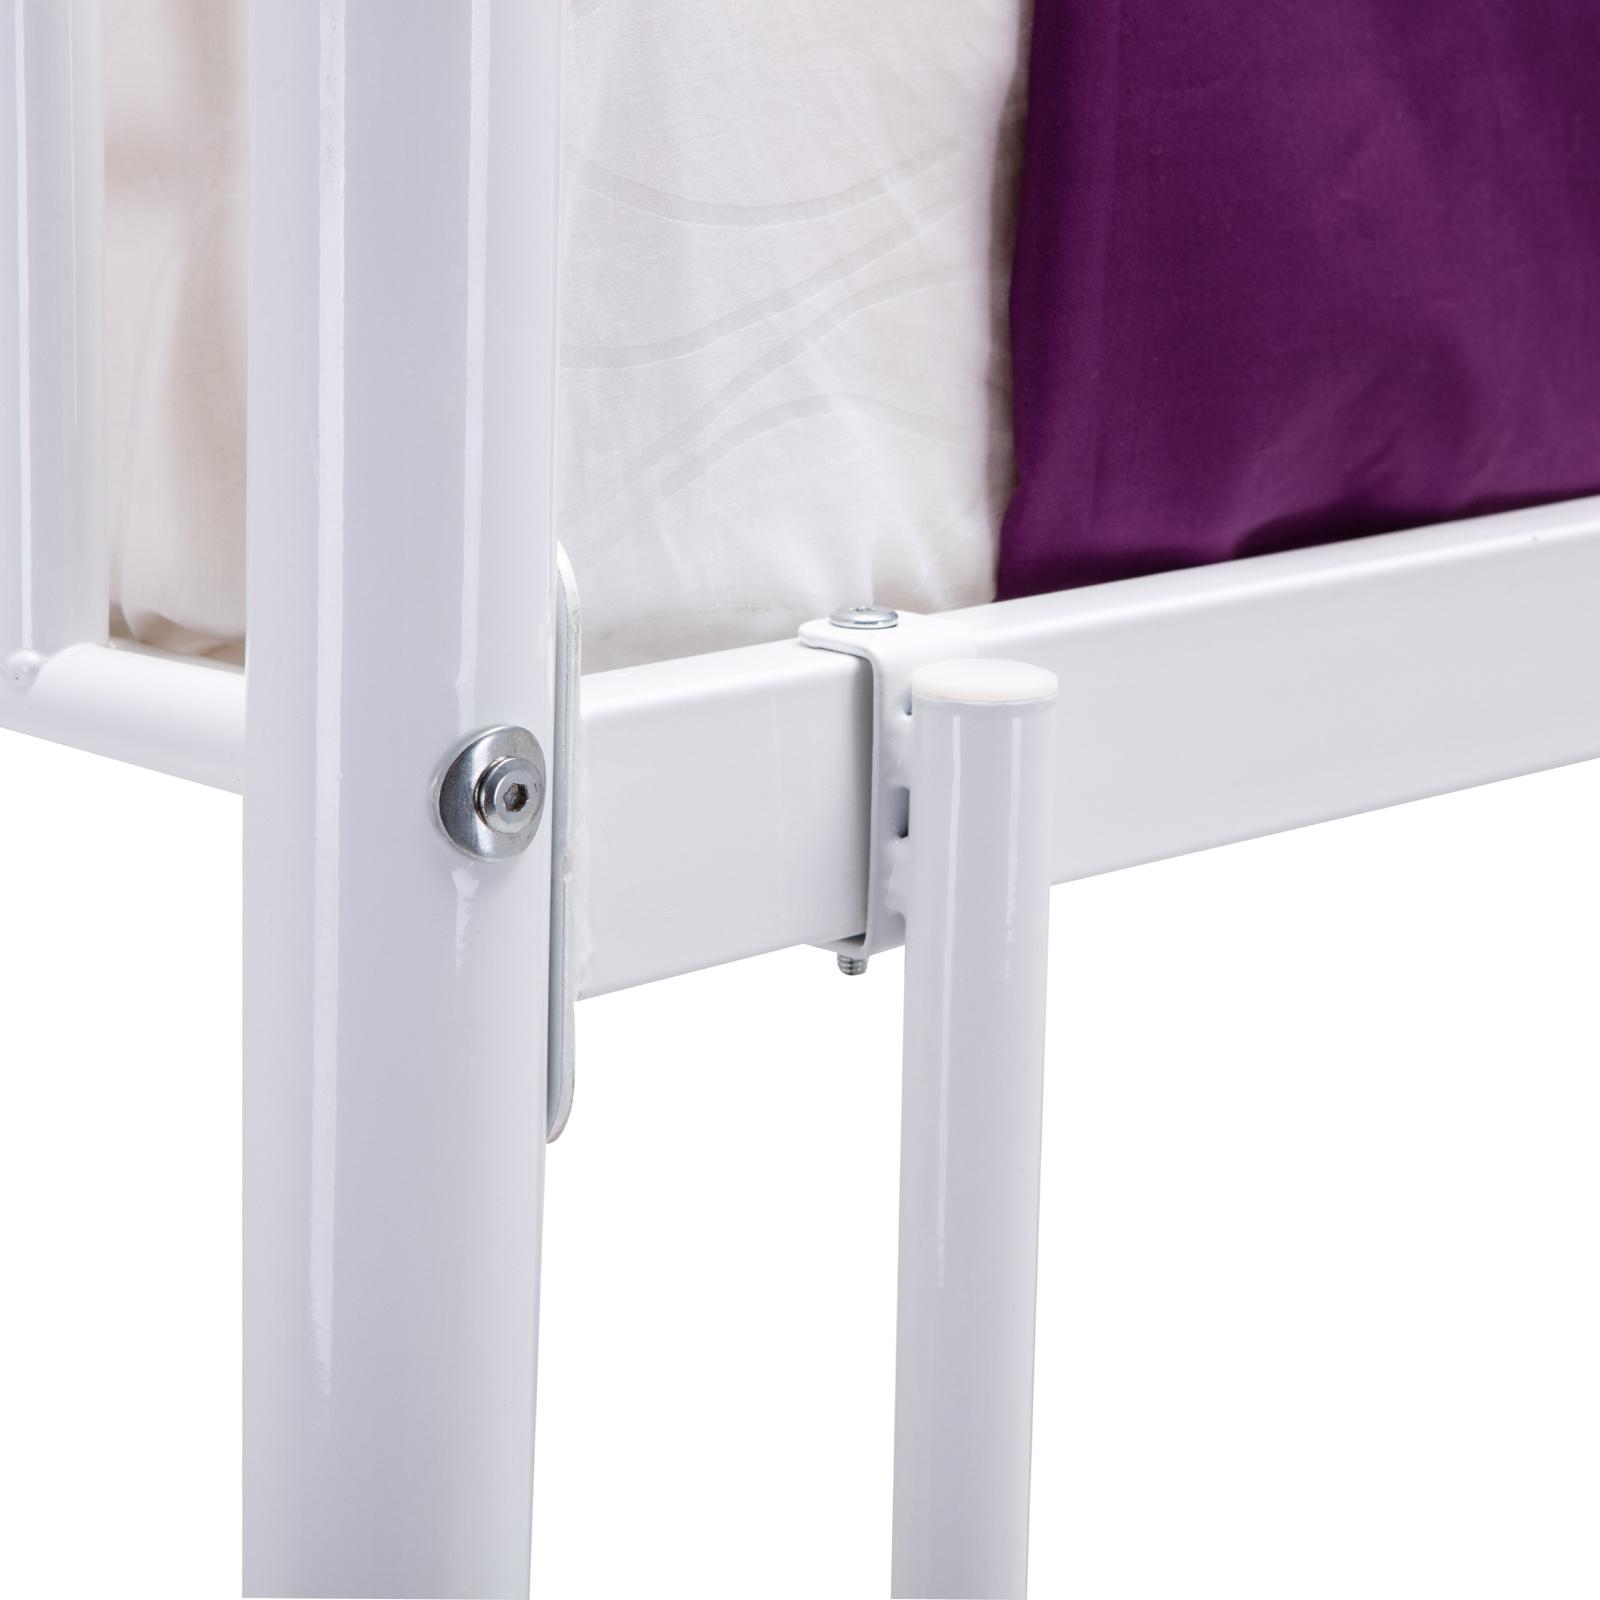 Metal-Bunk-Beds-Frame-Twin-over-Twin-Ladder-Bedroom-Dorm-for-Kids-Adult-Children